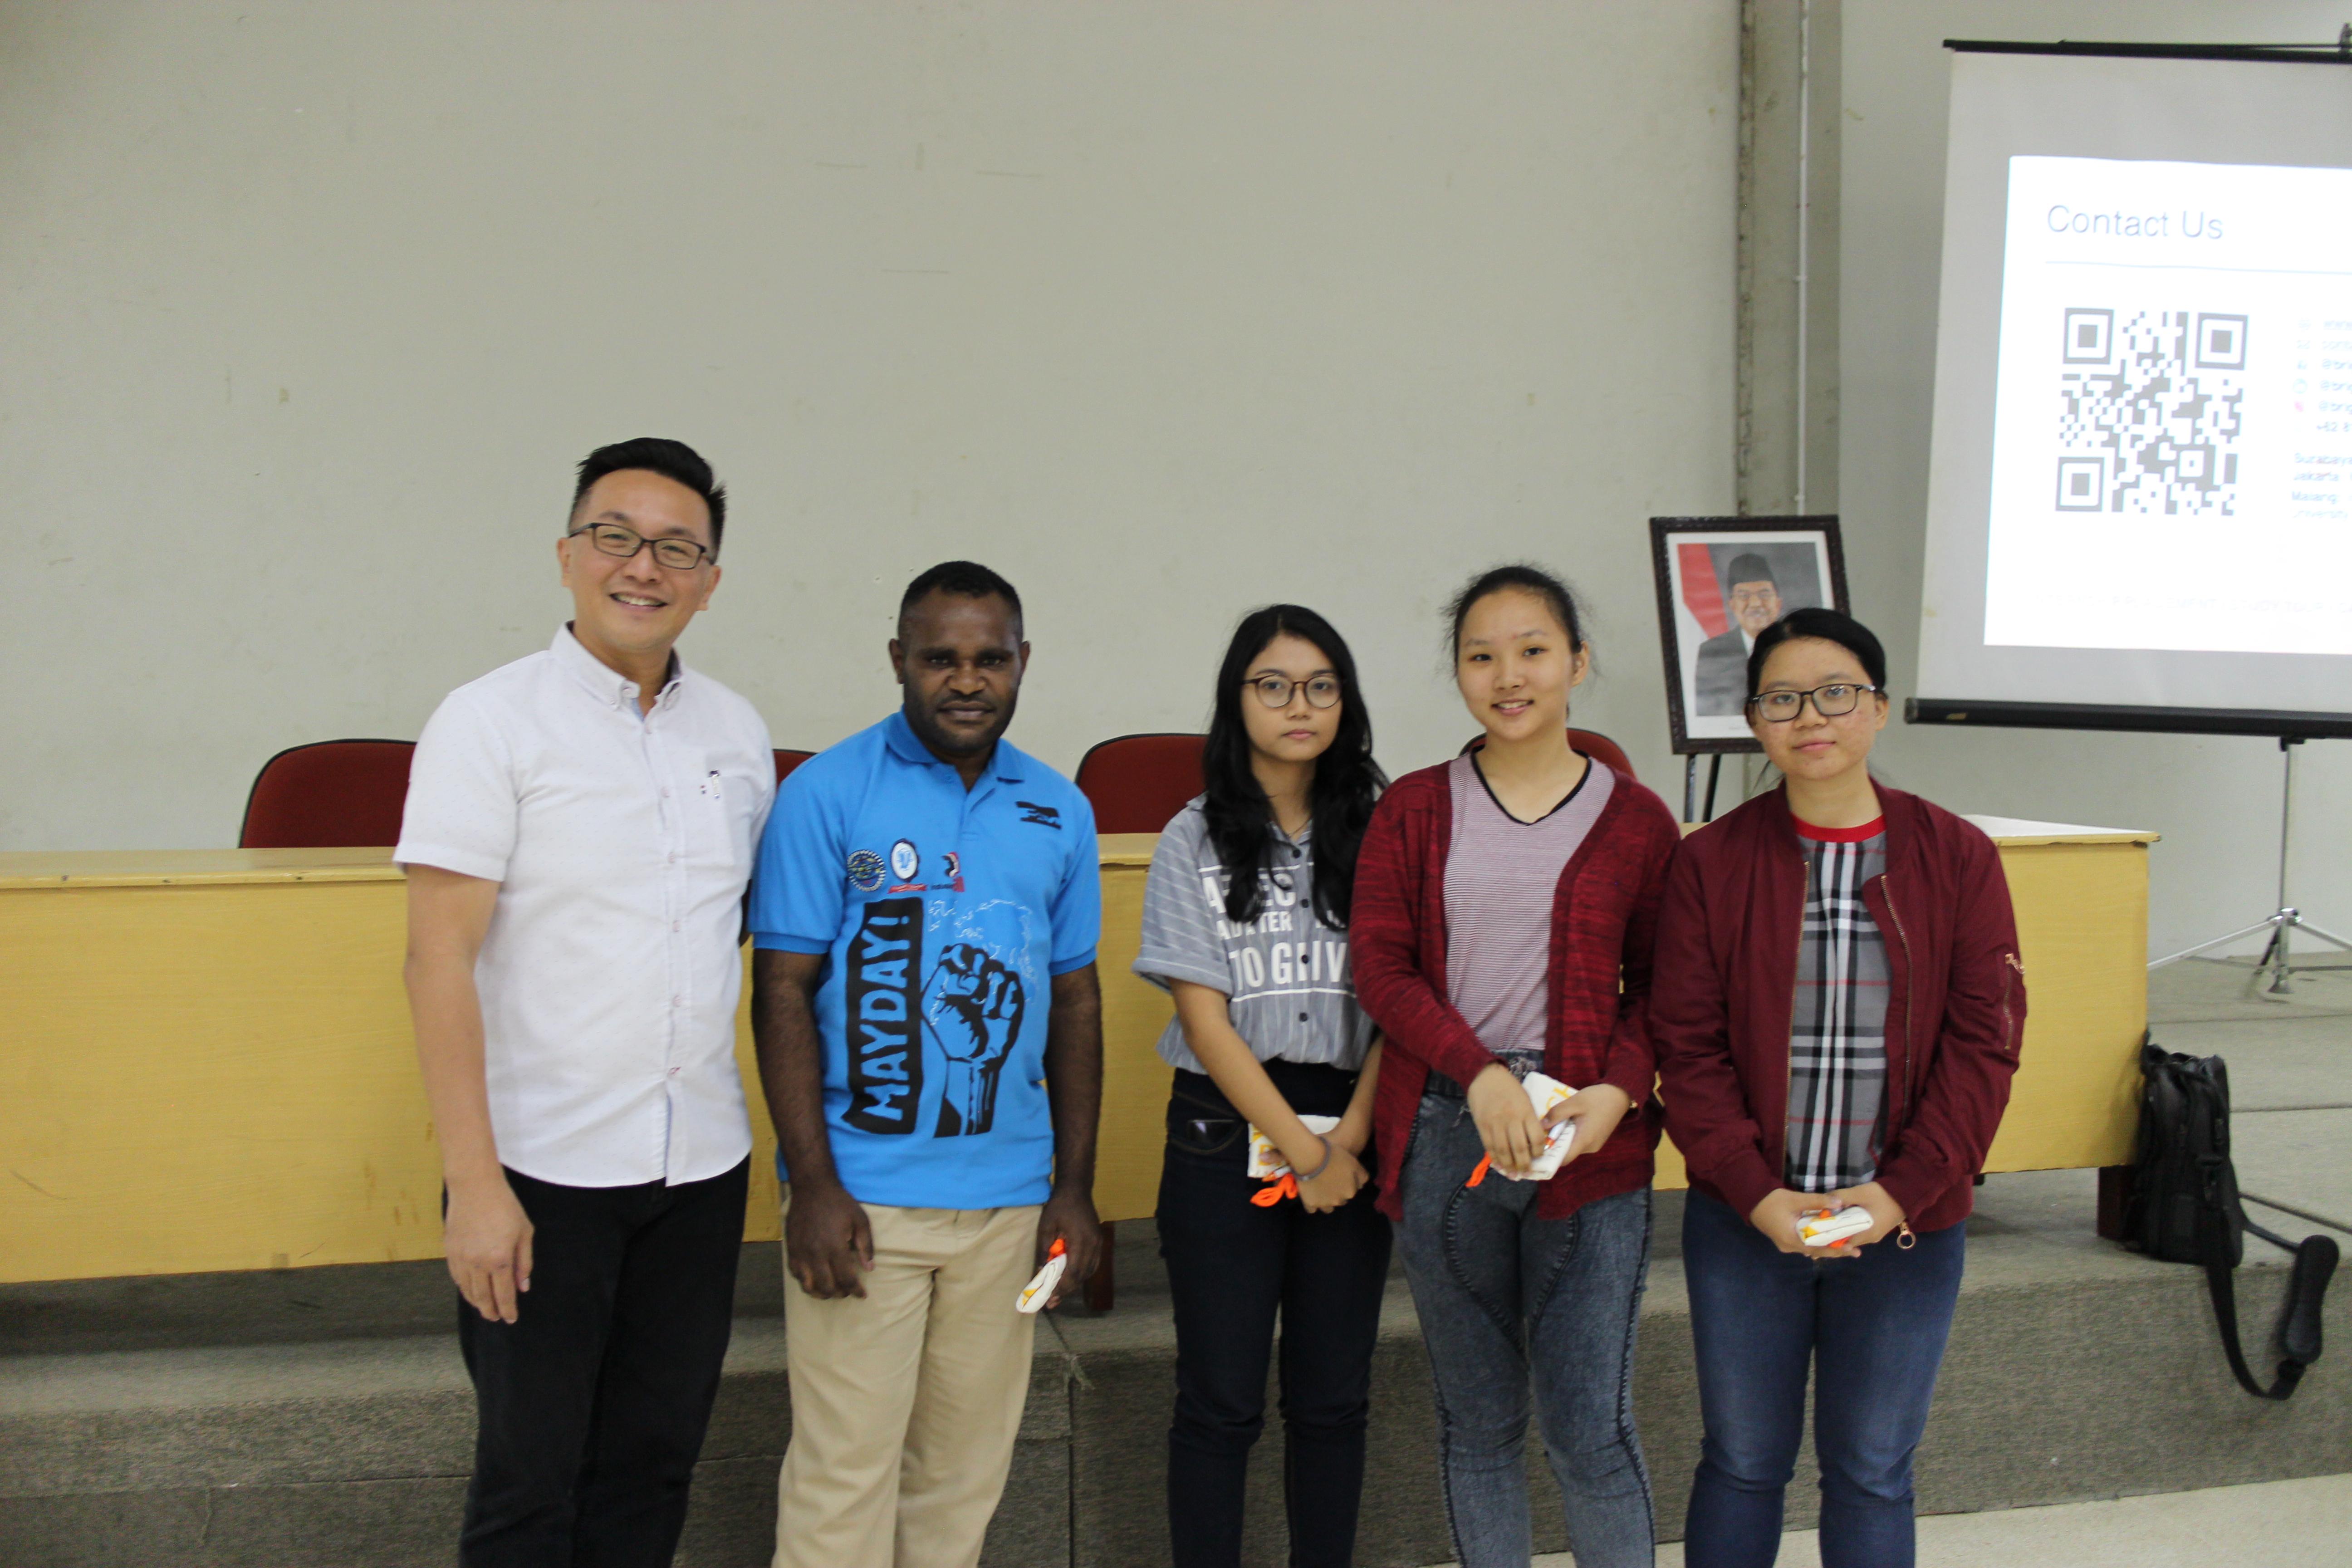 International Program Info Session at Universitas Katolik Widya Mandala Surabaya